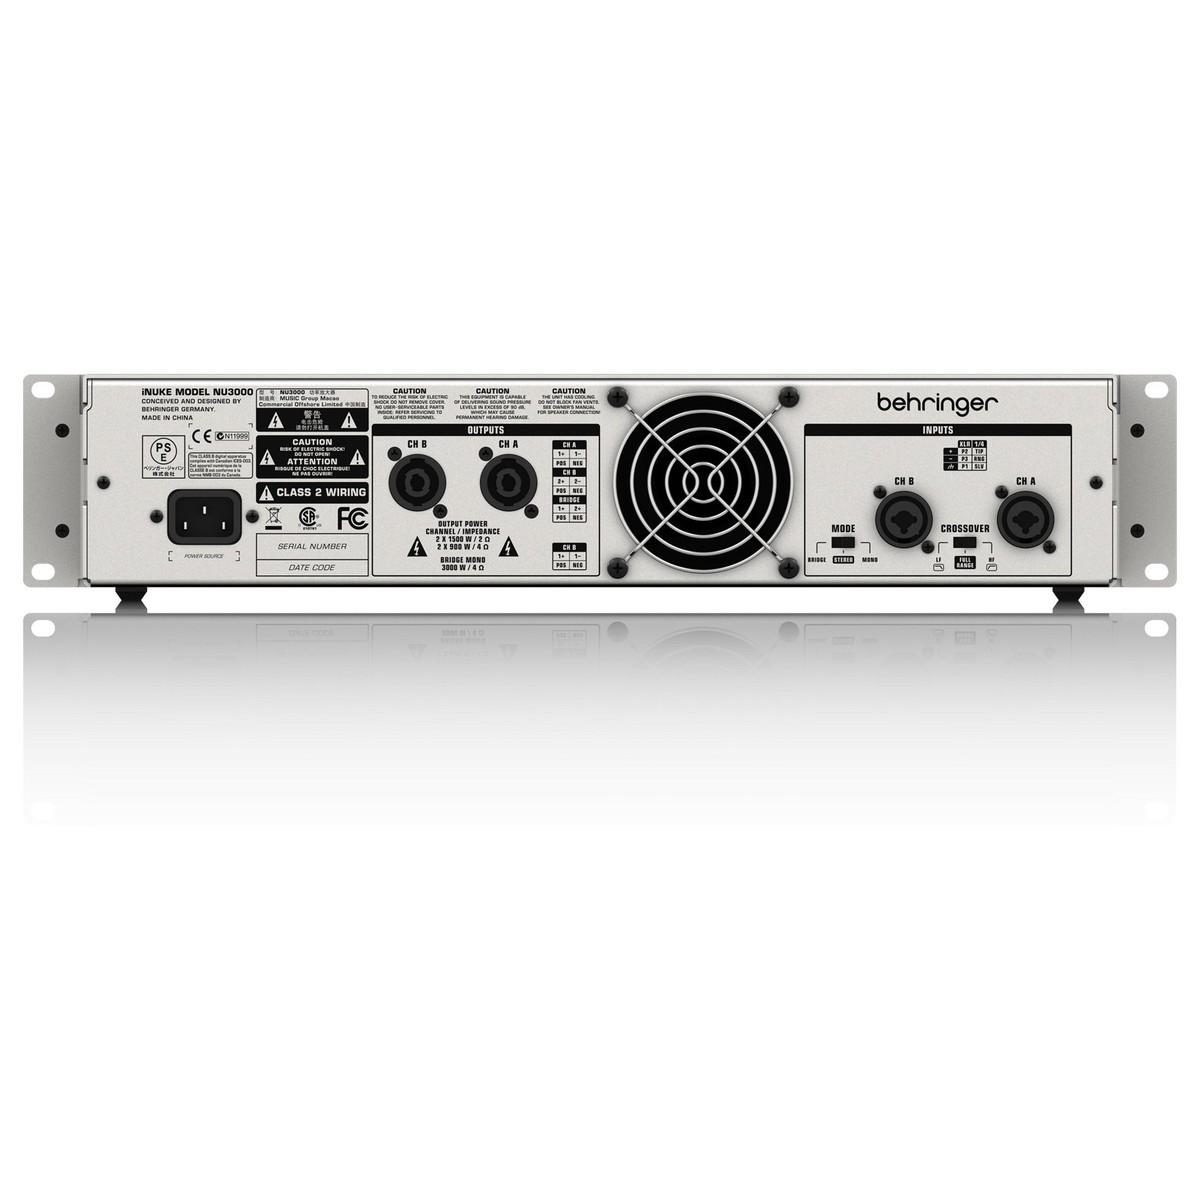 Behringer Inuke Nu3000 Power Amp At Gear4music Bridged Wiring An